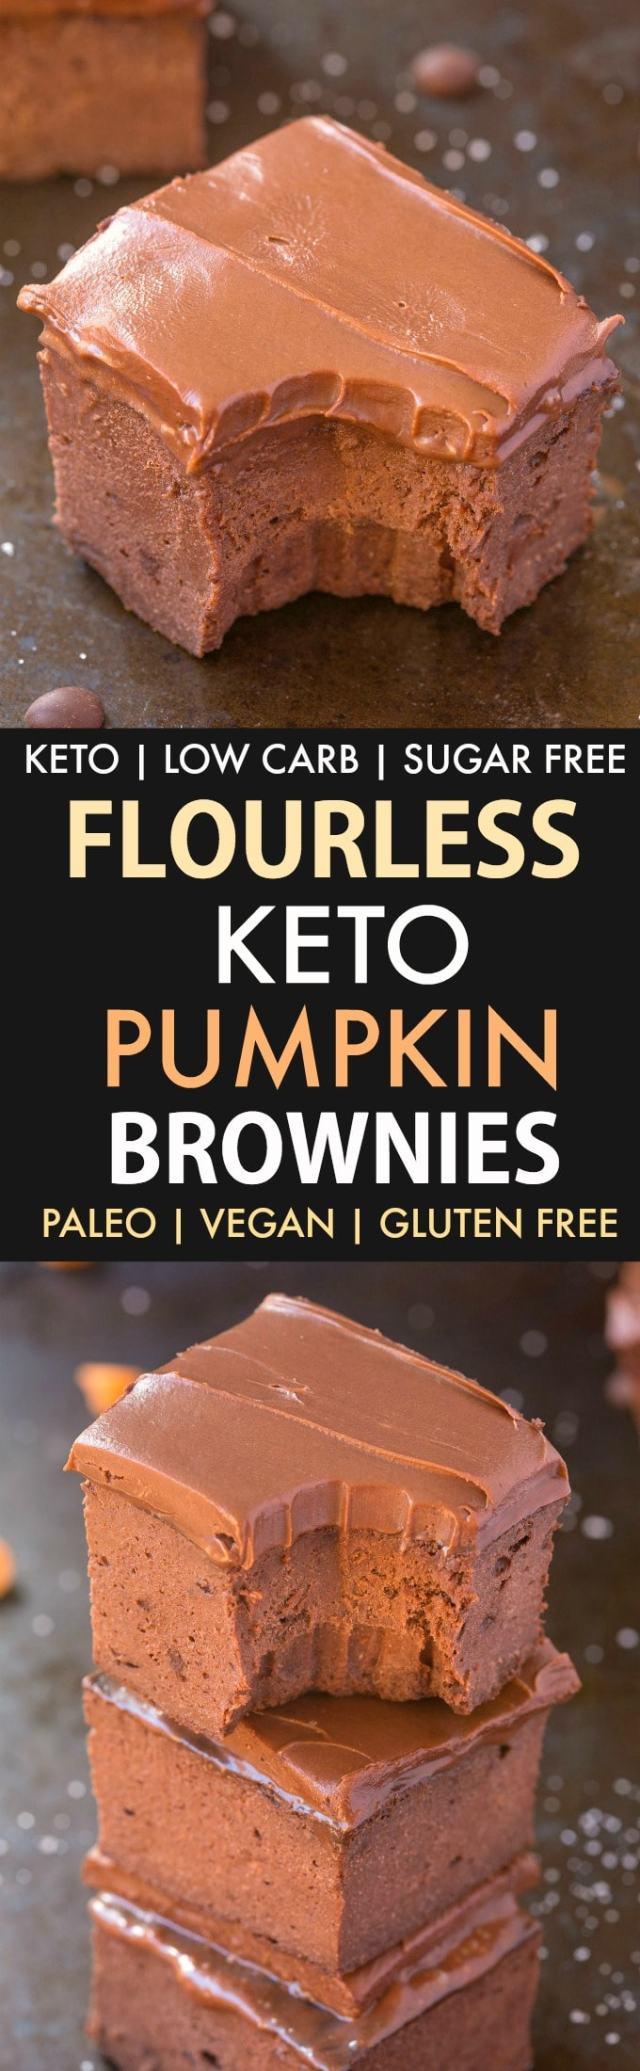 3-Ingredient Flourless Pumpkin Brownies in a collage